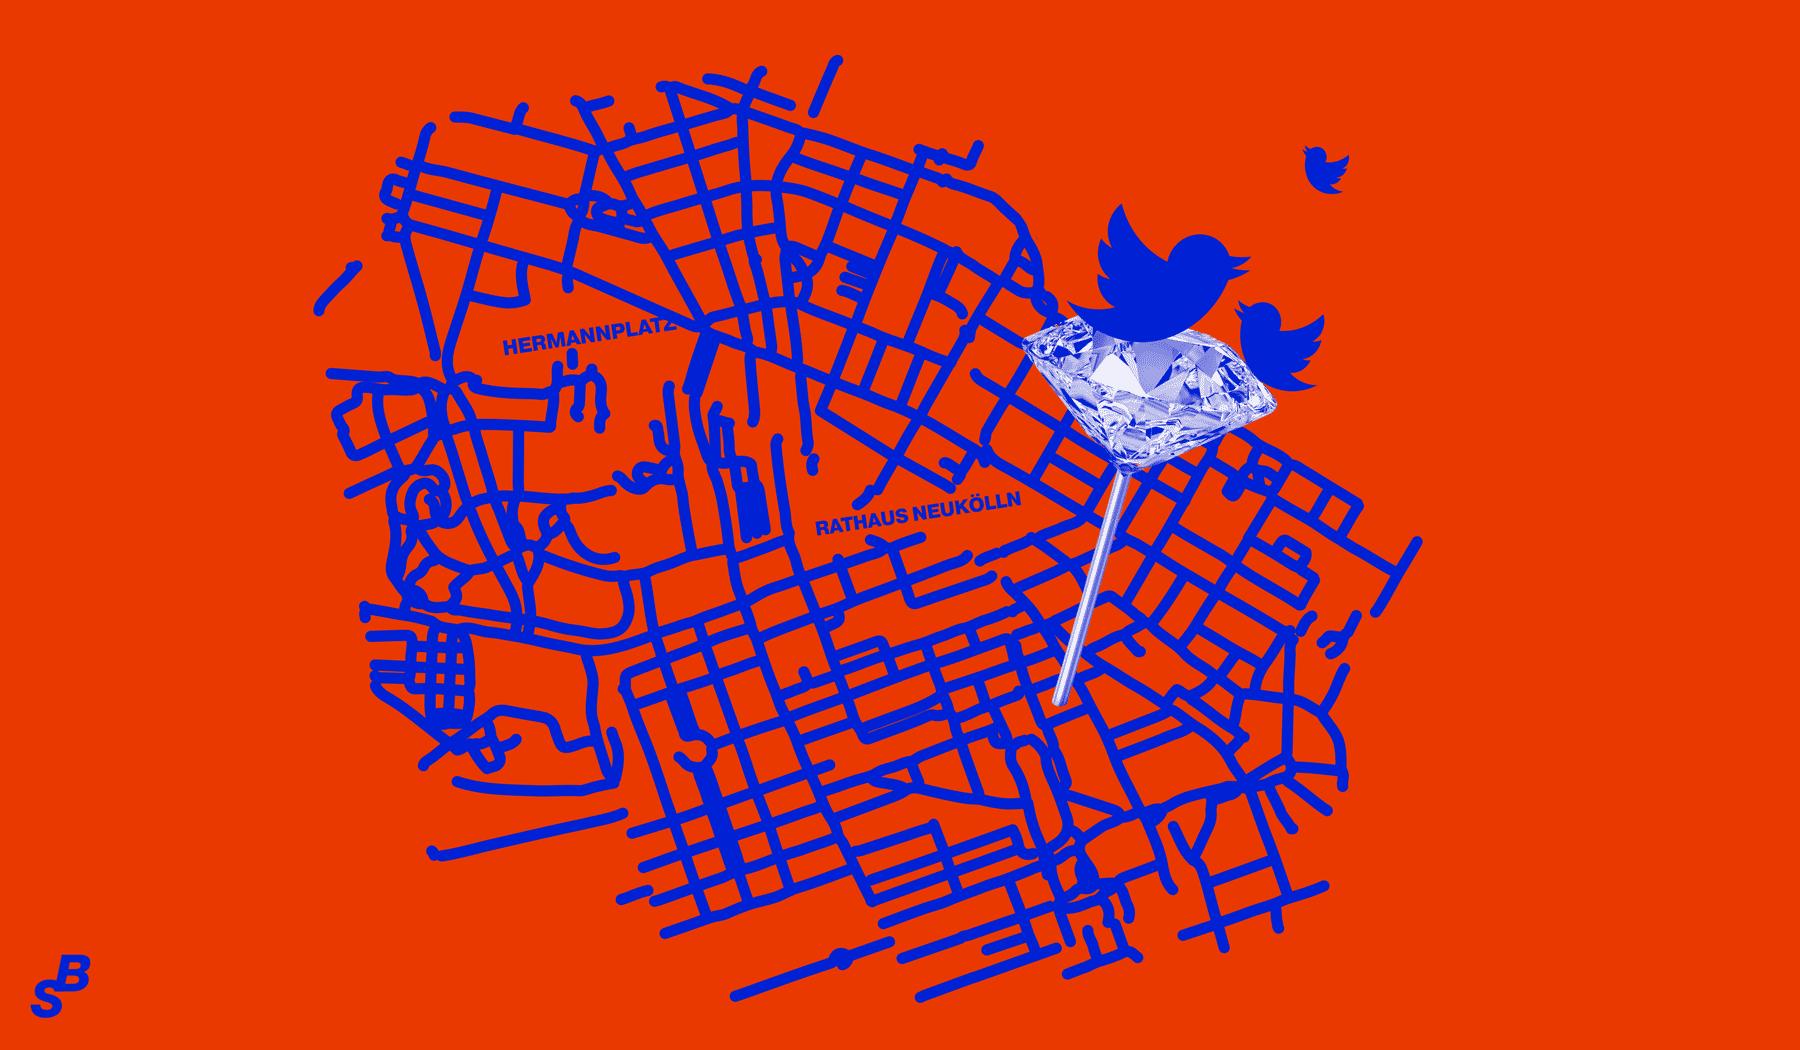 FUTURE TRENDS by Startling Brands, Gentrification Social Media, Illustration by Mario Dzurila